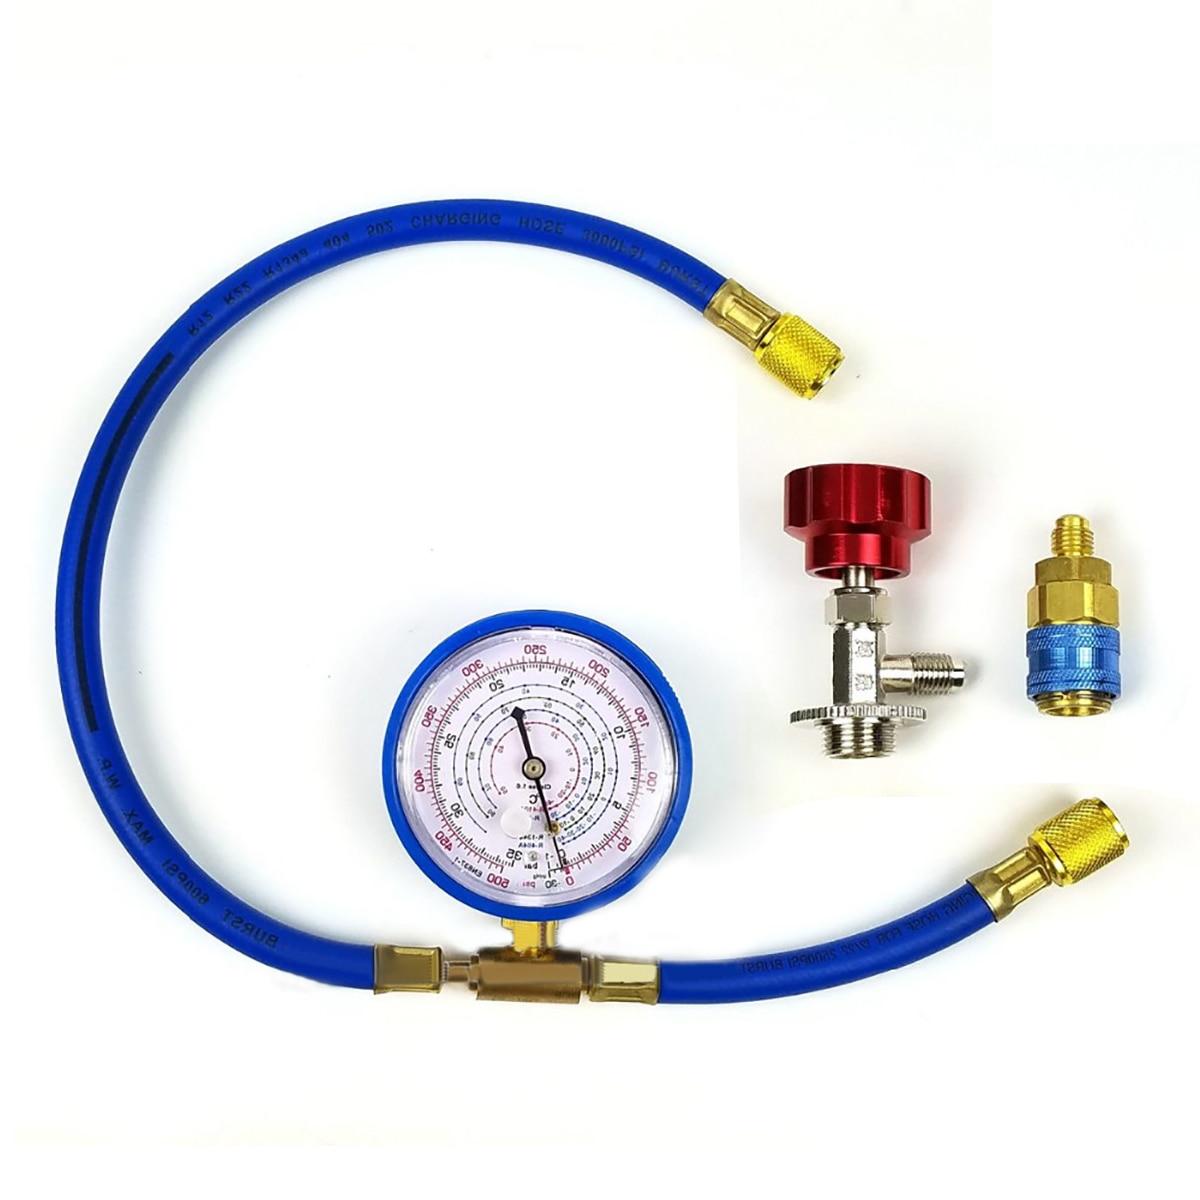 1 Set New M14 R134a Refrigerant Charging Hose With Gauge Recharge Measuring Tool1 Set New M14 R134a Refrigerant Charging Hose With Gauge Recharge Measuring Tool